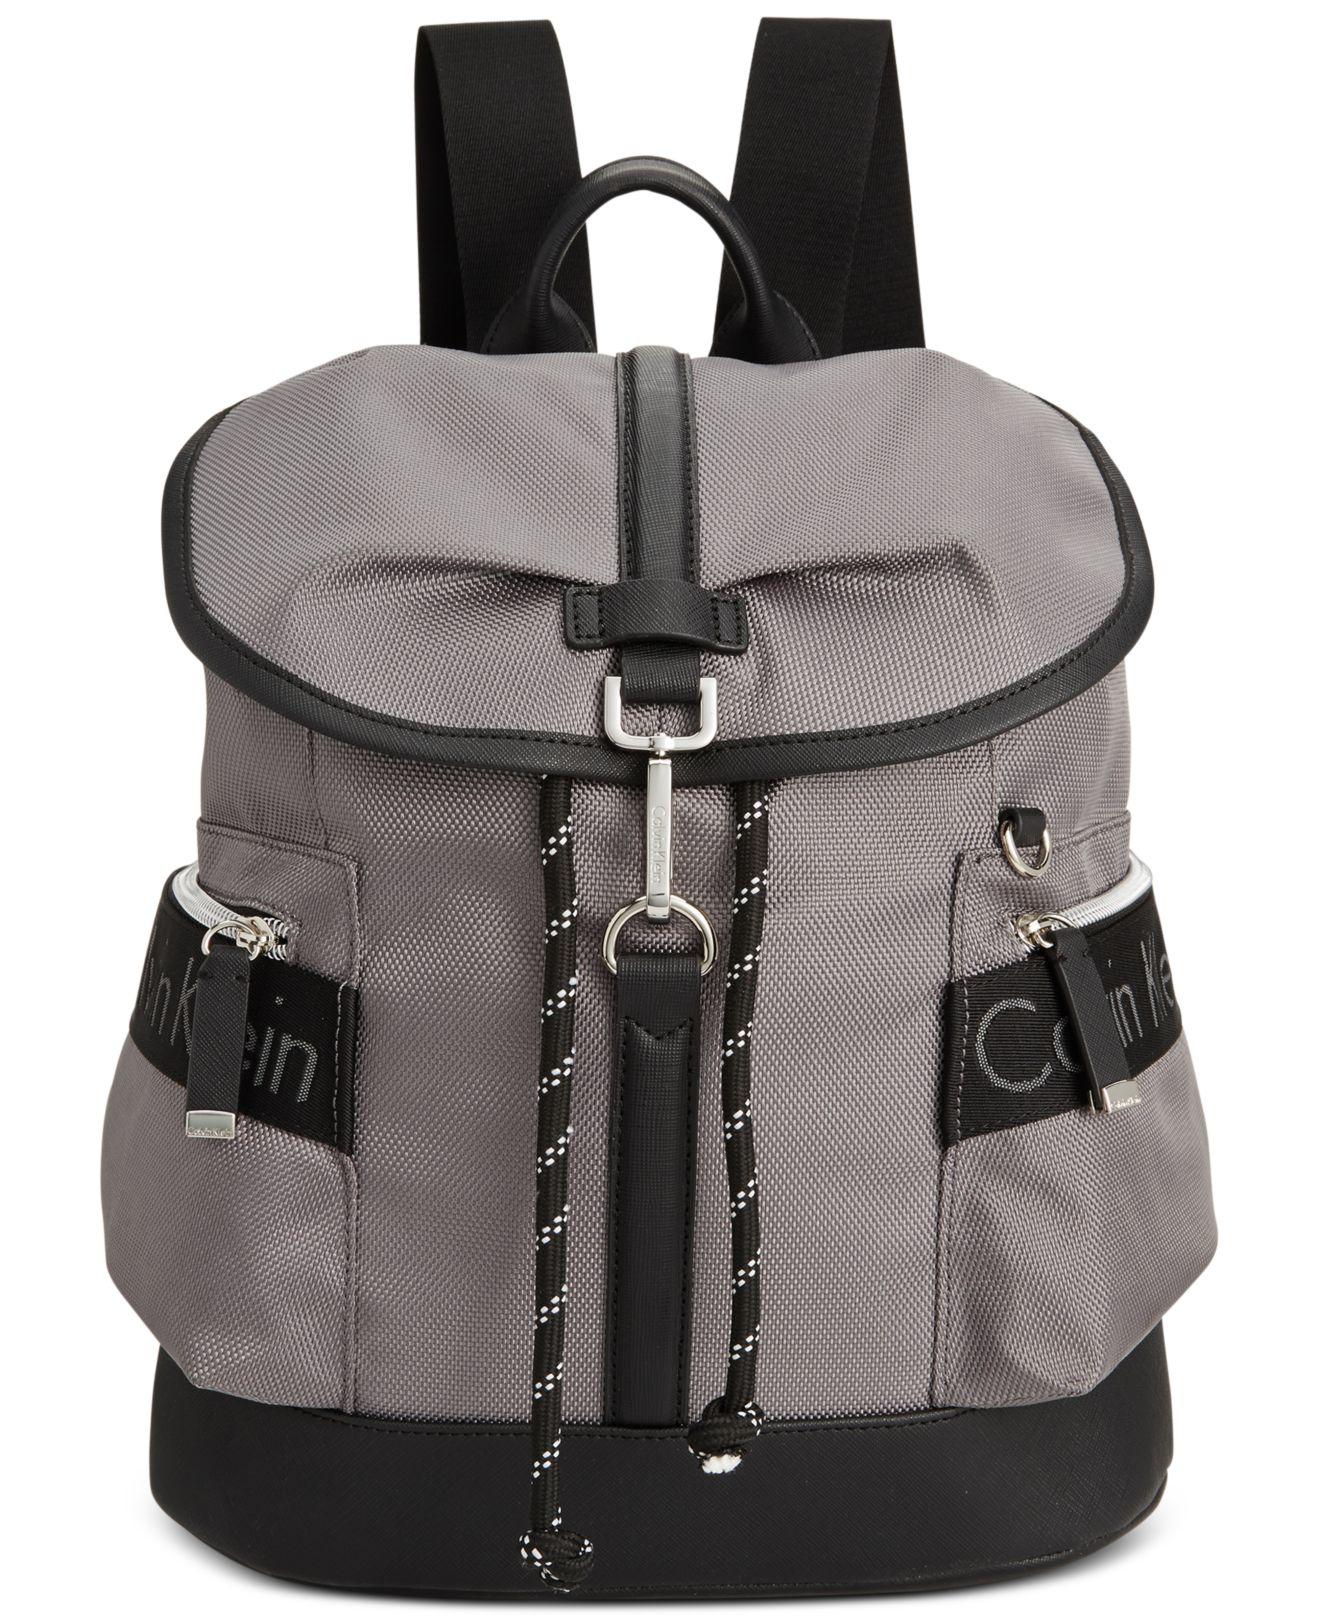 6b91962cea12 Lyst - Calvin Klein Ballistic Nylon Backpack in Black